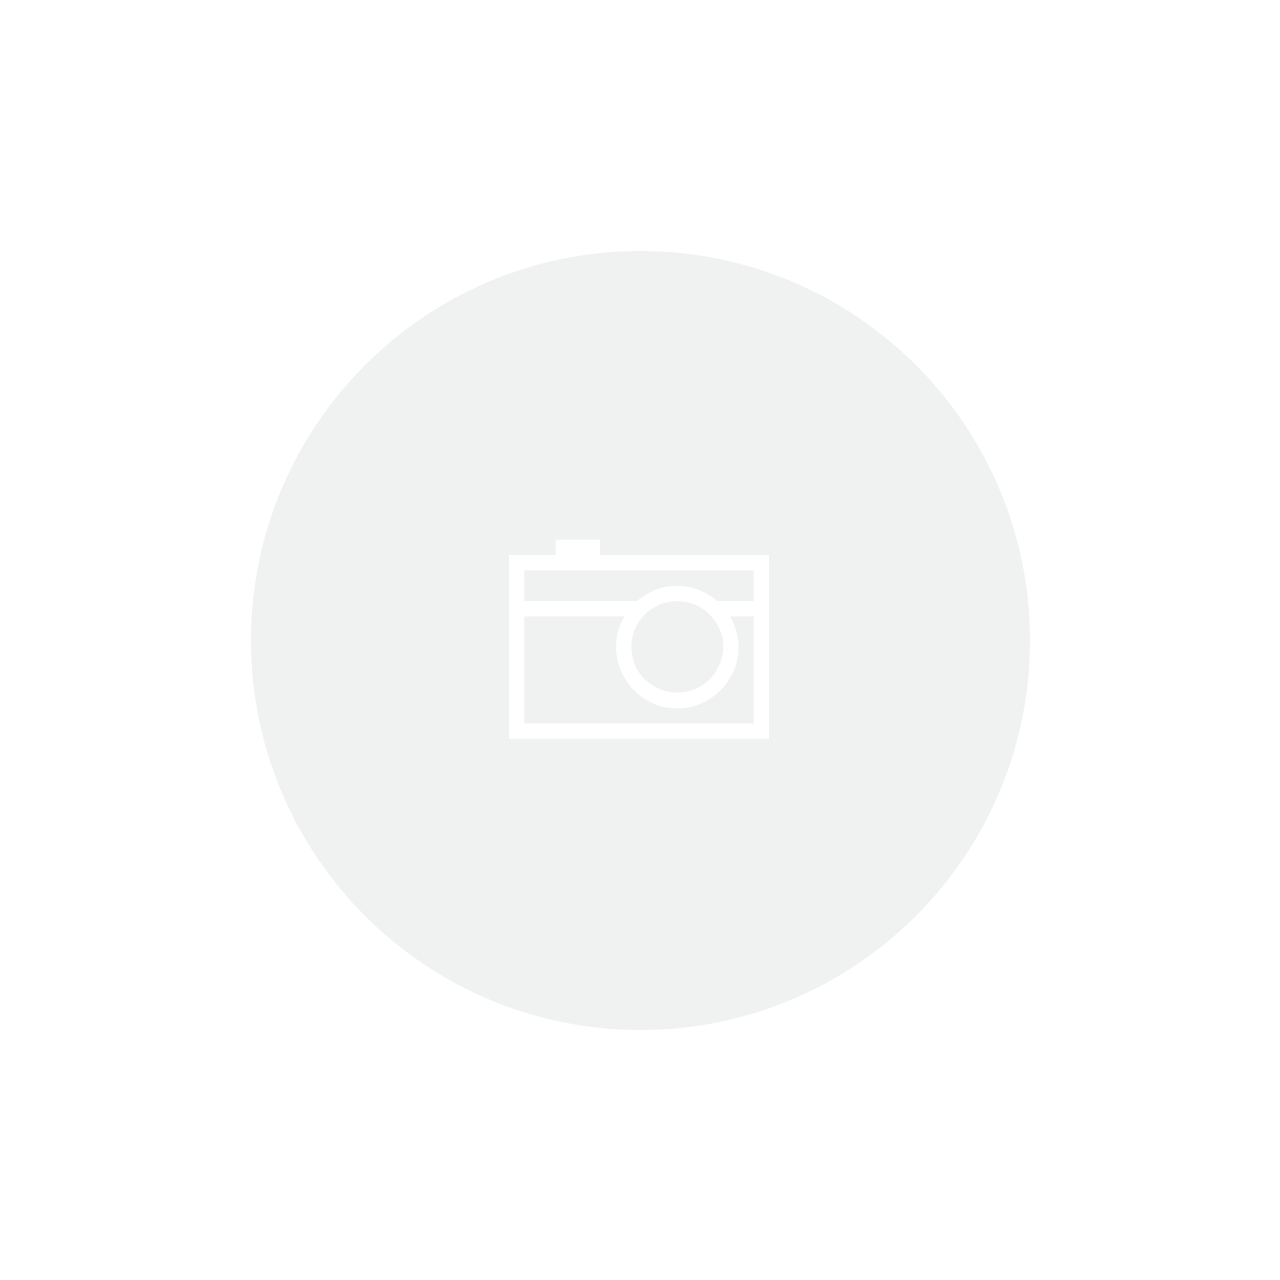 Stickers - Ref. 957D